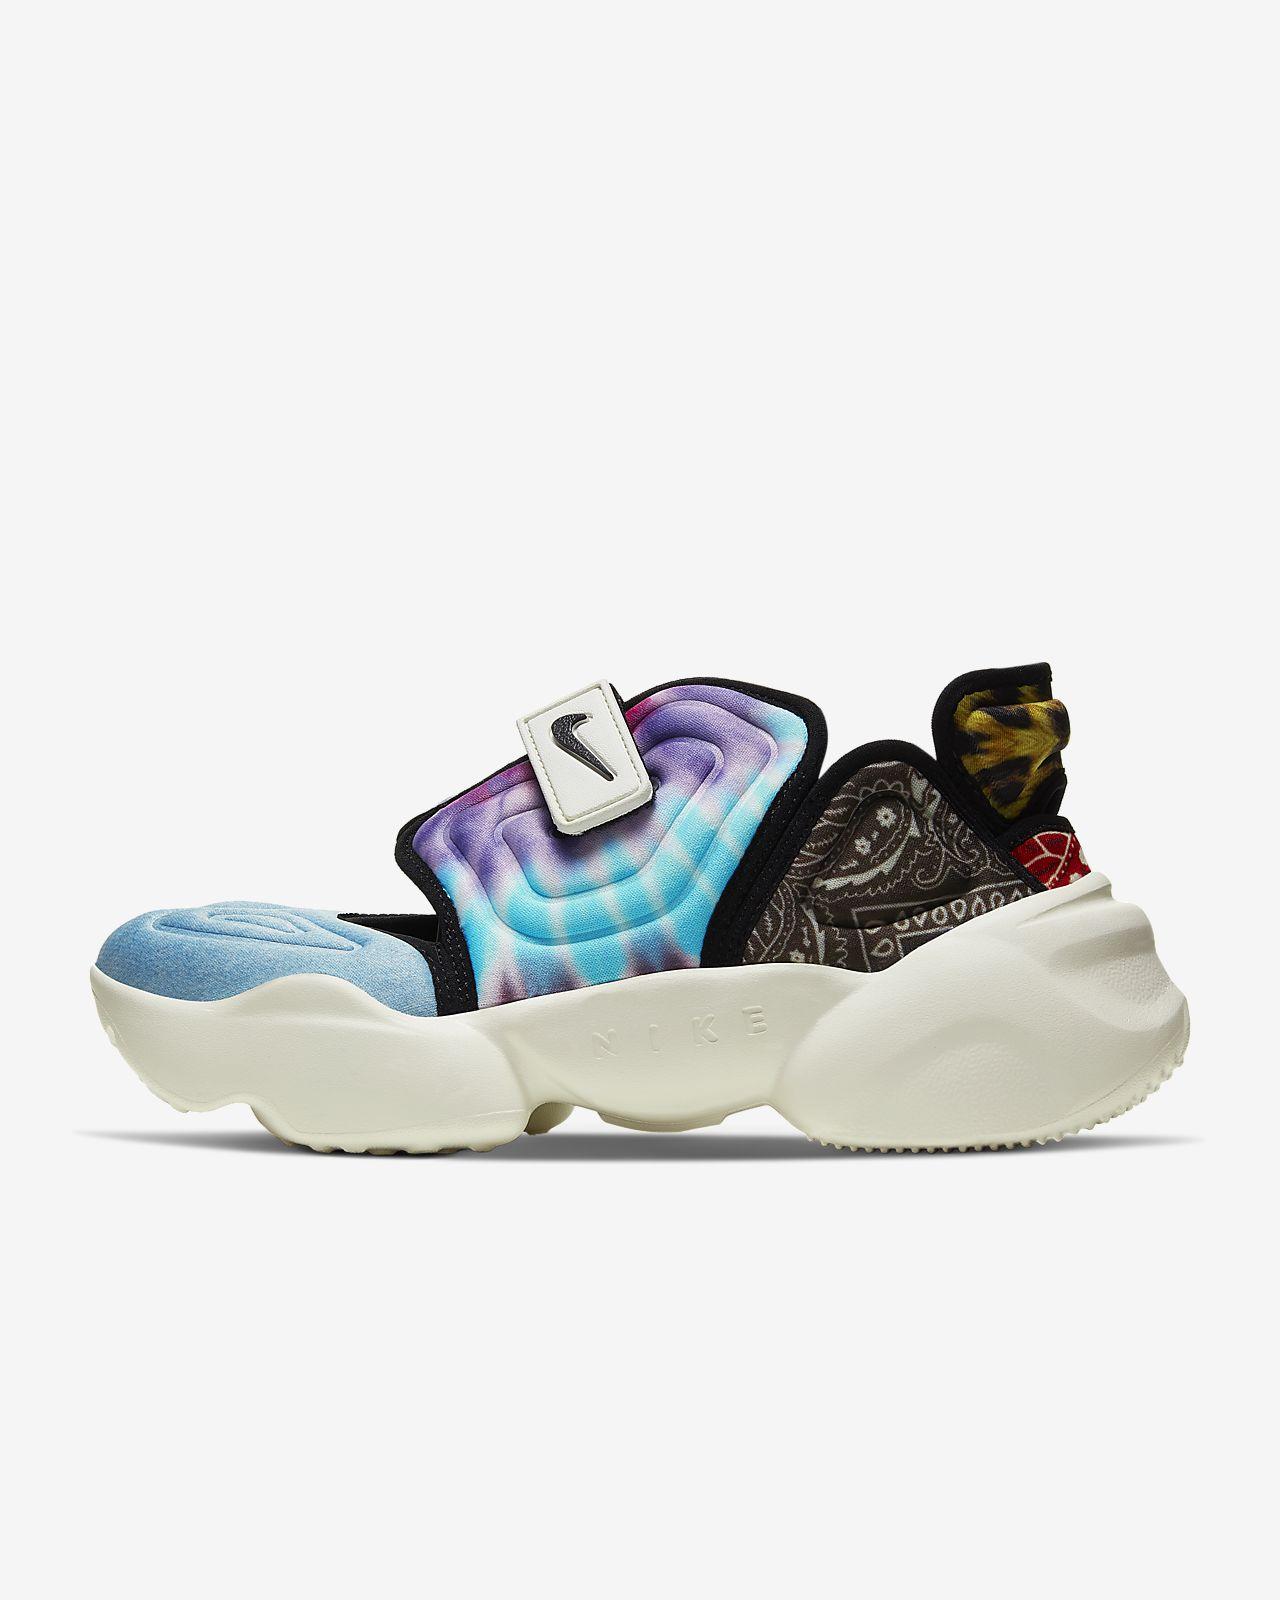 Chaussure Nike Aqua Rift pour Femme